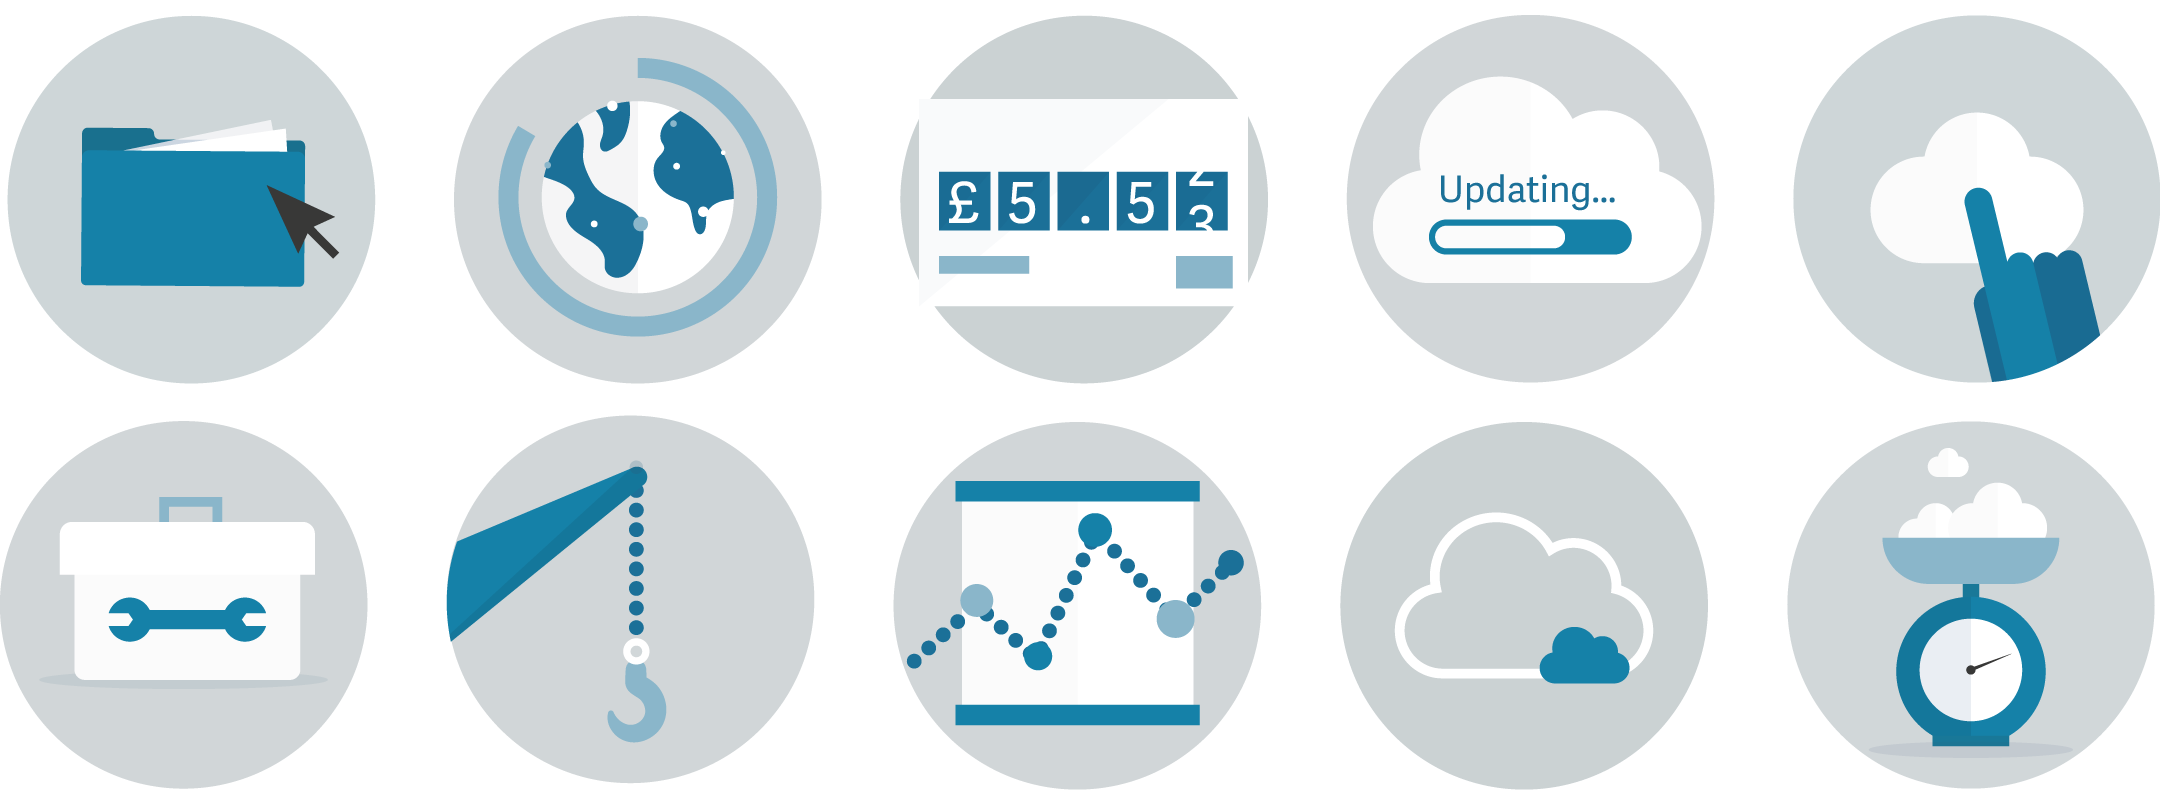 ShellShock - Our Work - Cloud Computing for Sage